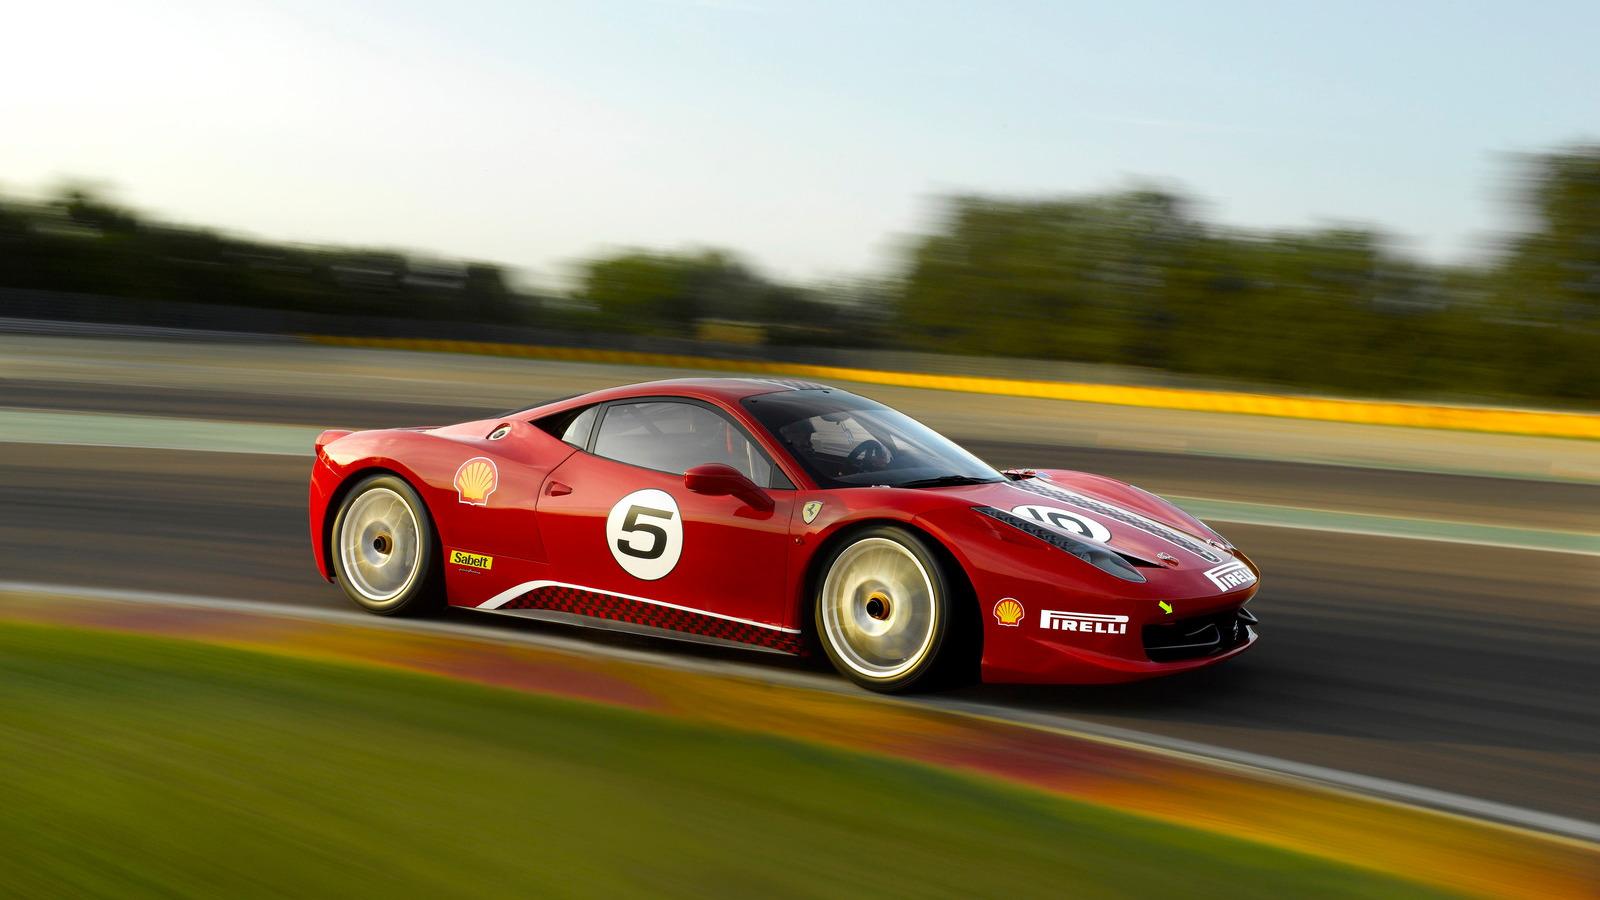 Ferrari 458 Challenge at Vallelunga